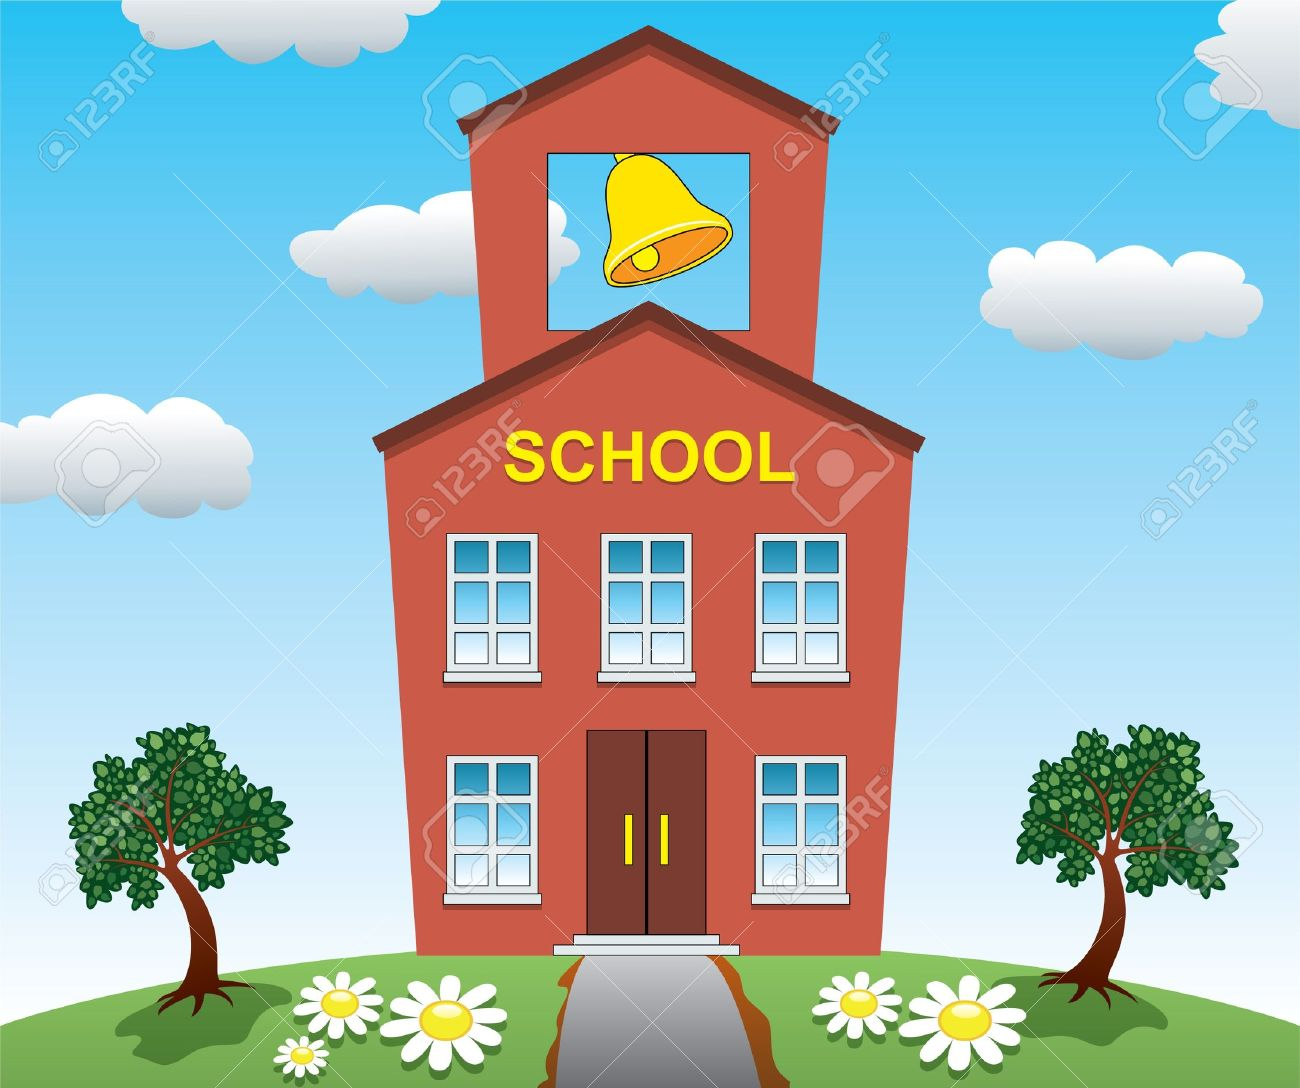 Illustration of school house Stock Vector - 10278431